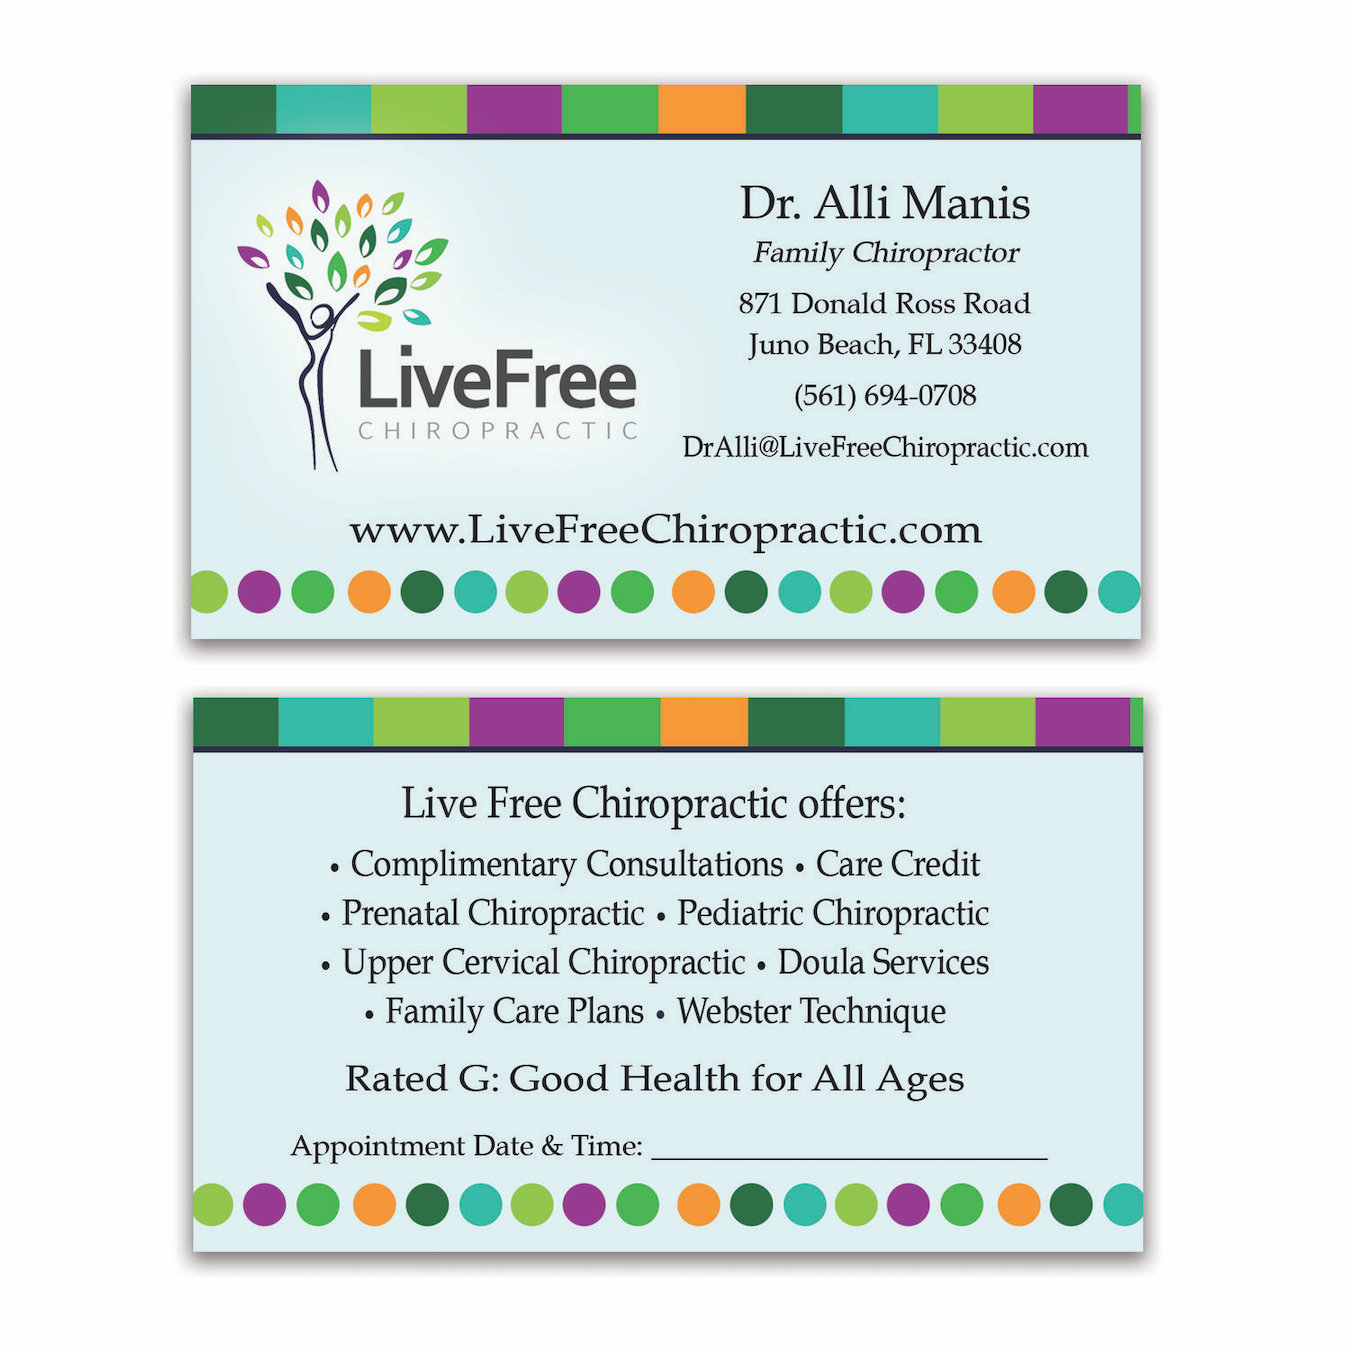 Chiropractor Business Card Design